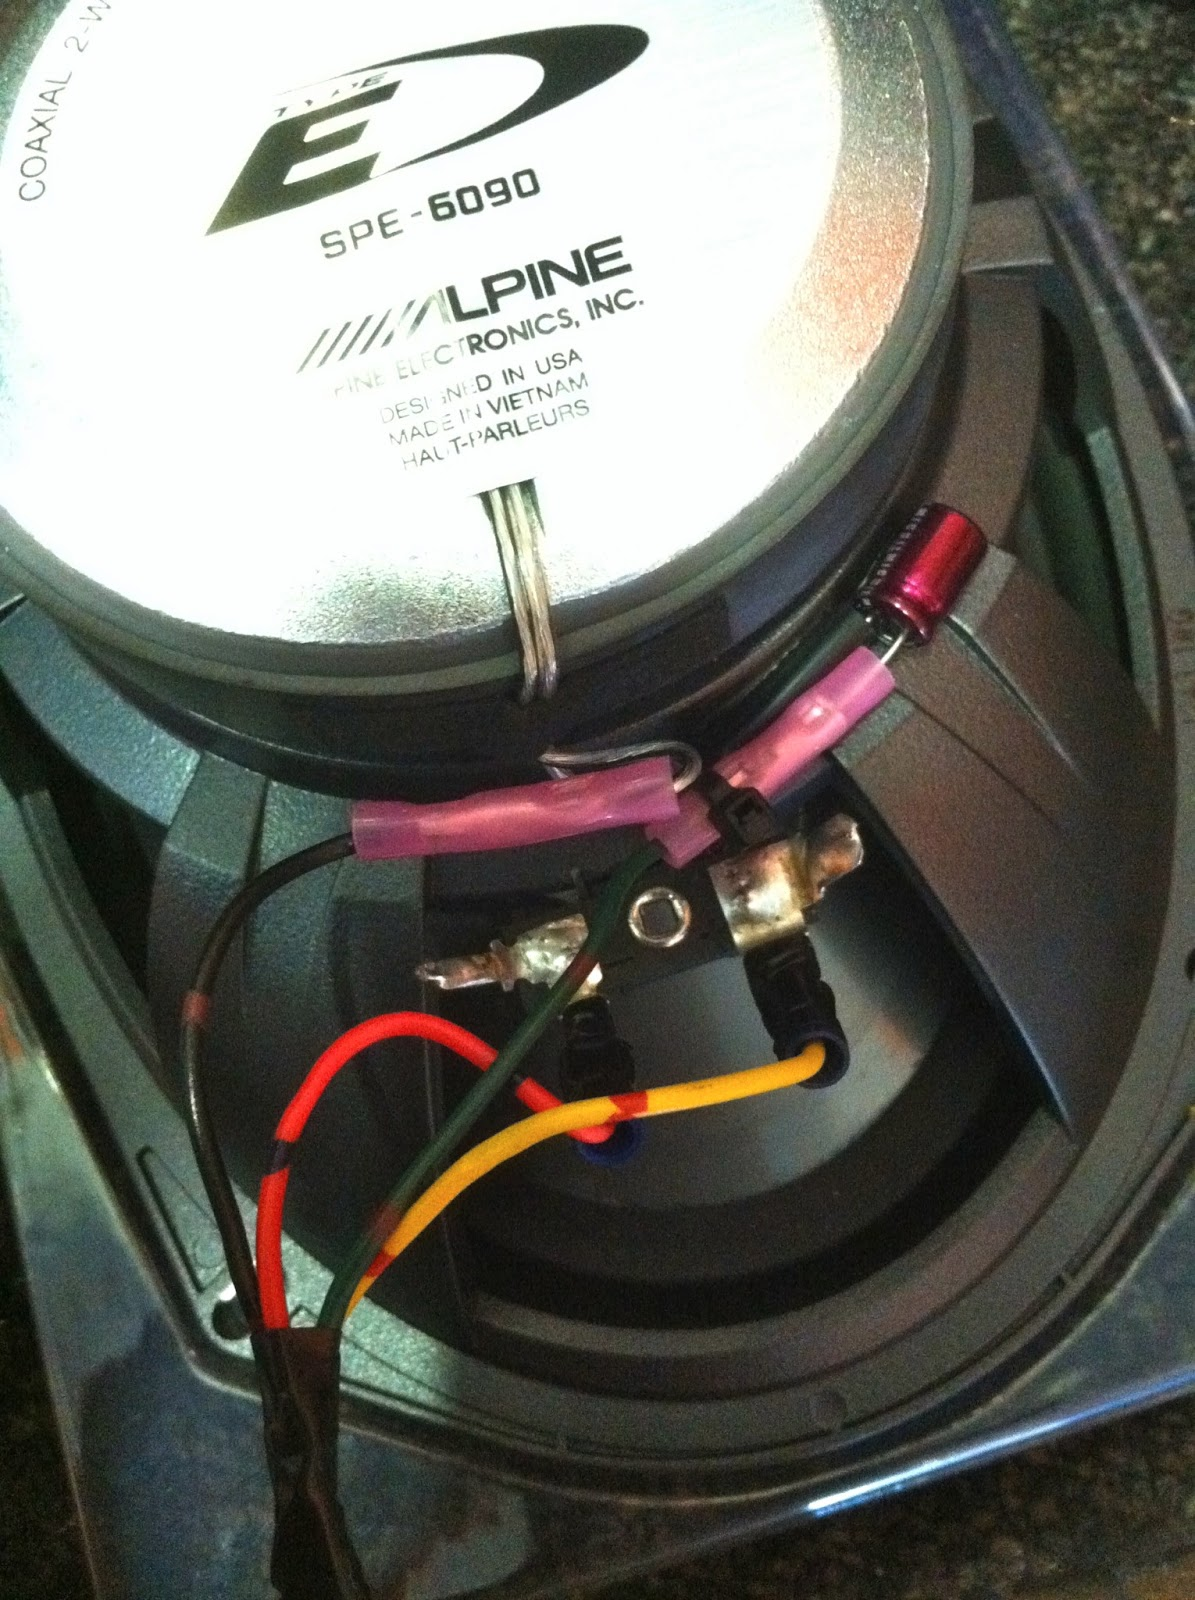 camry rear speaker upgrade alpine speakers jeremy car audio expert [ 1195 x 1600 Pixel ]